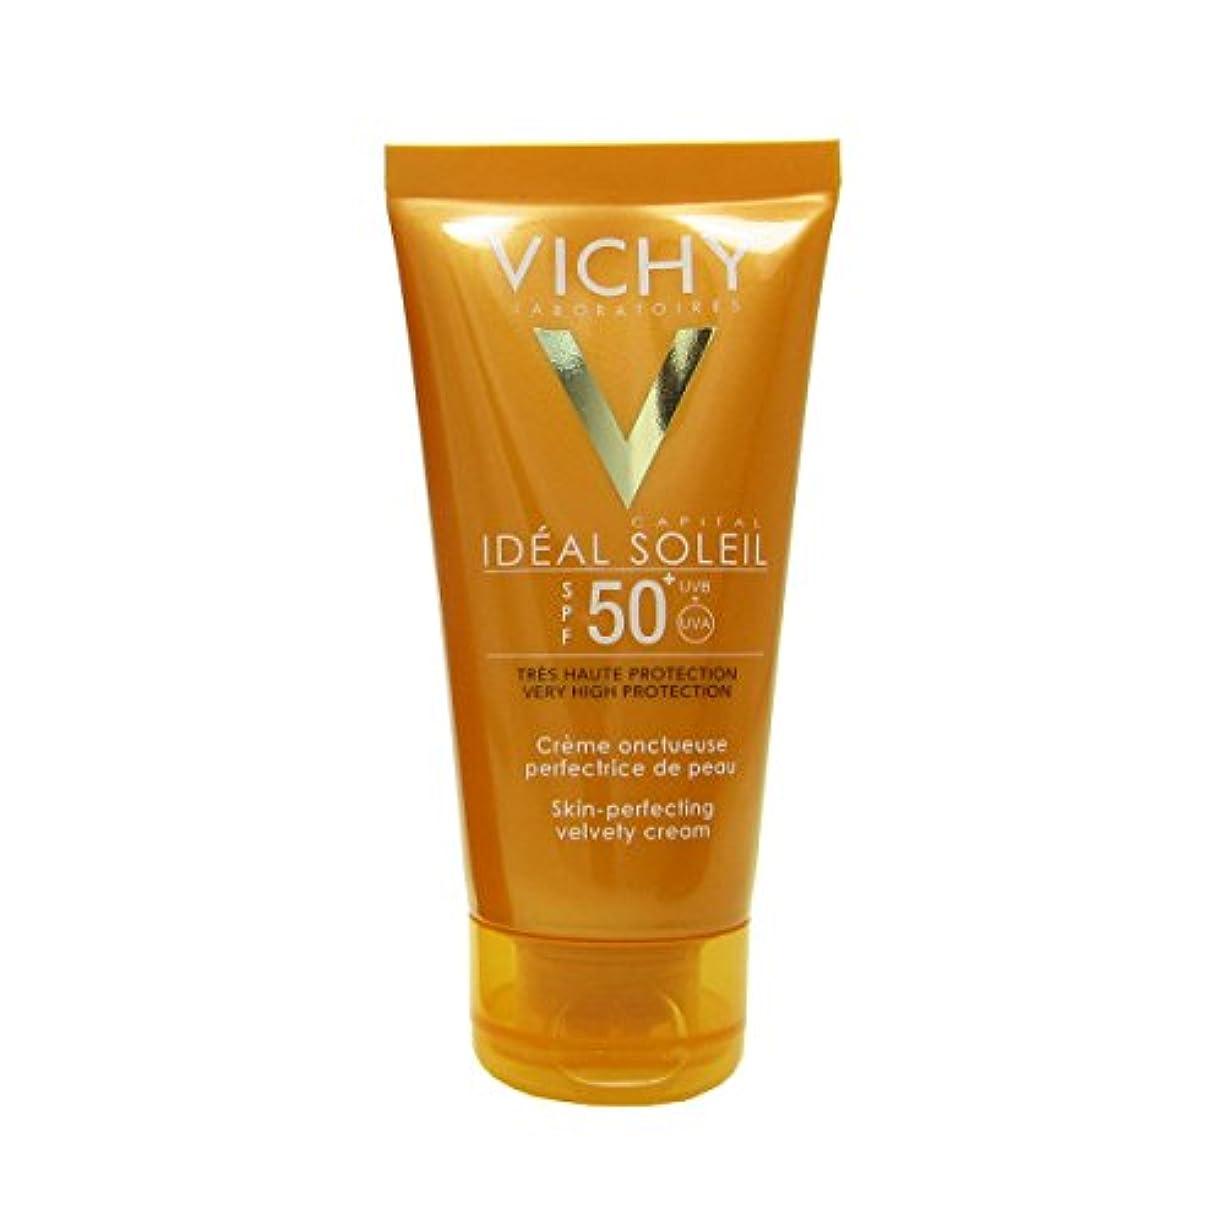 Vichy Id饌l Soleil Spf 50 Crema Unctuous 50ml [並行輸入品]